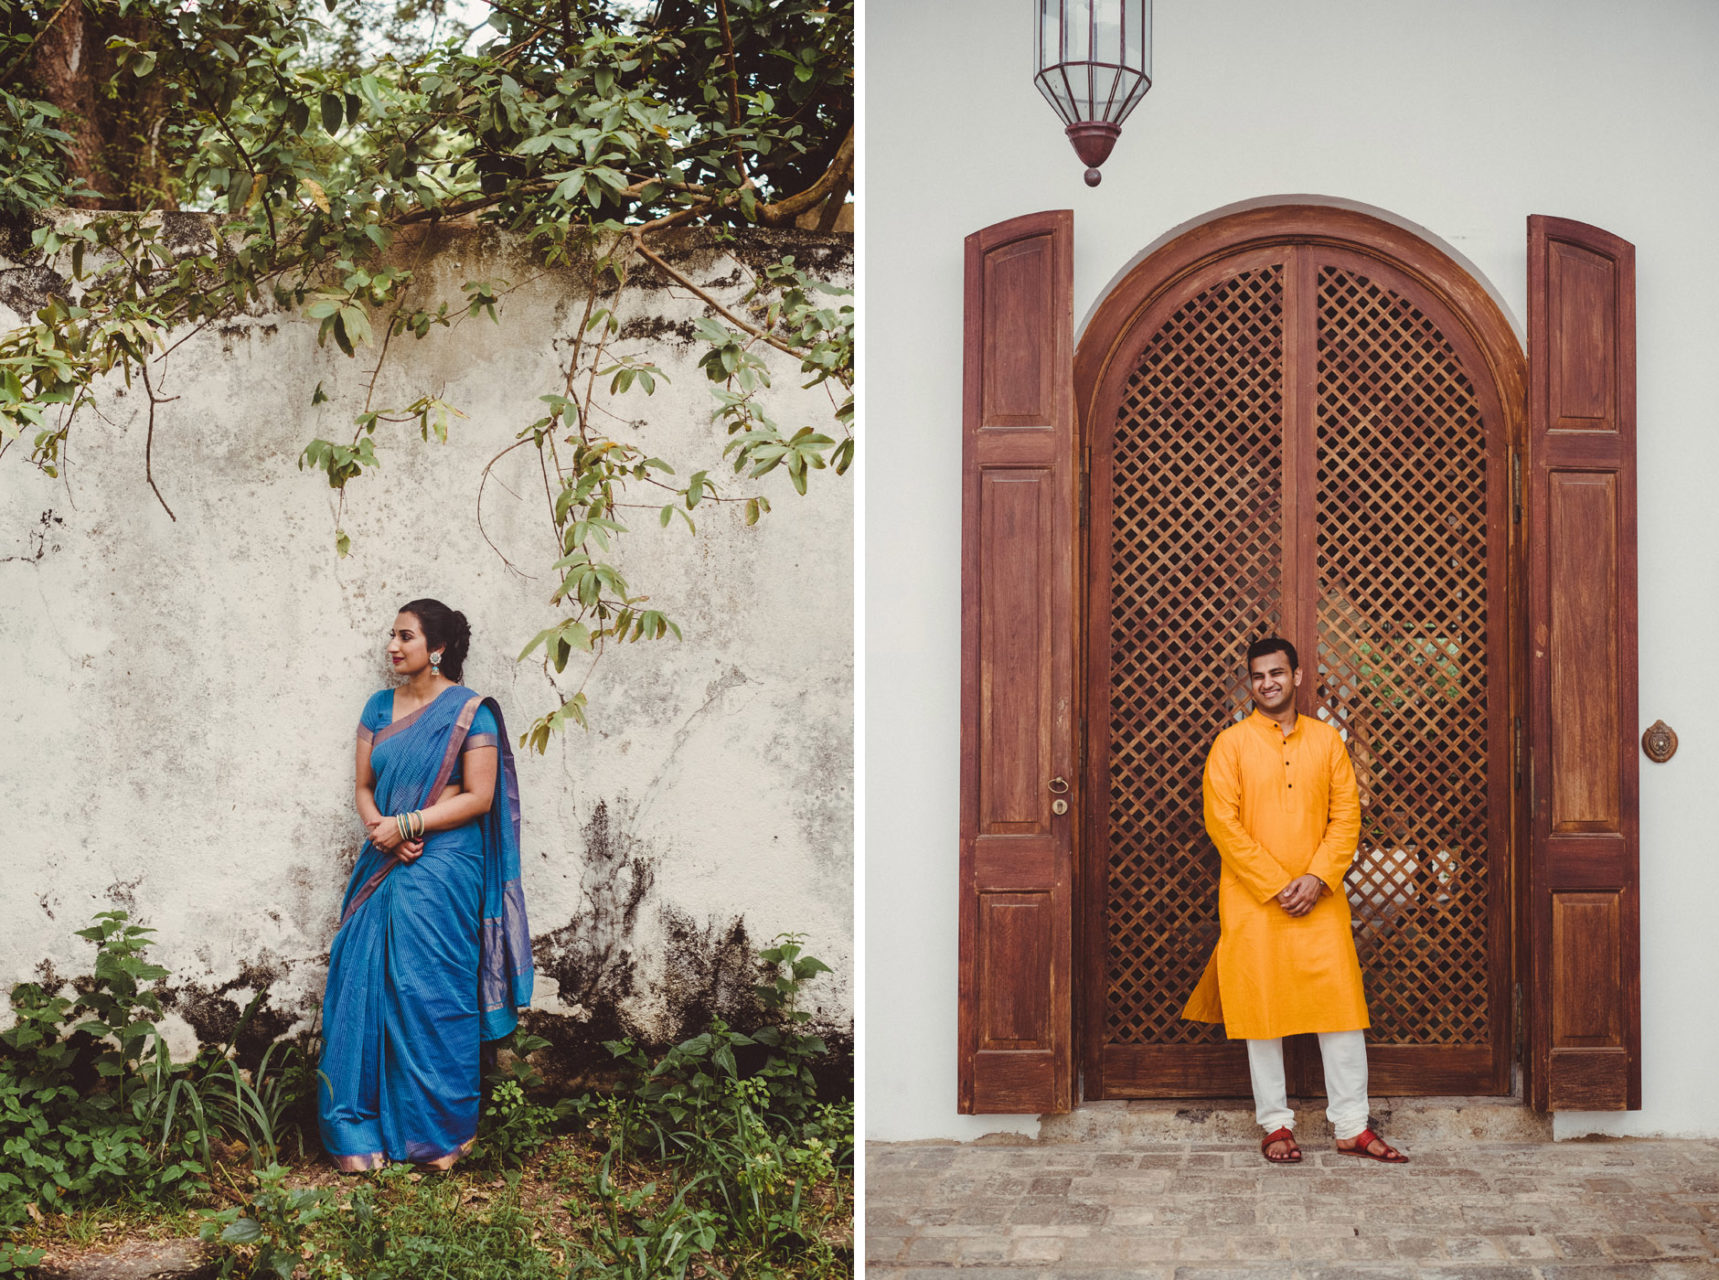 sri-lankan-wedding-photographer_kritdushan0086ab-1719x1280.jpg